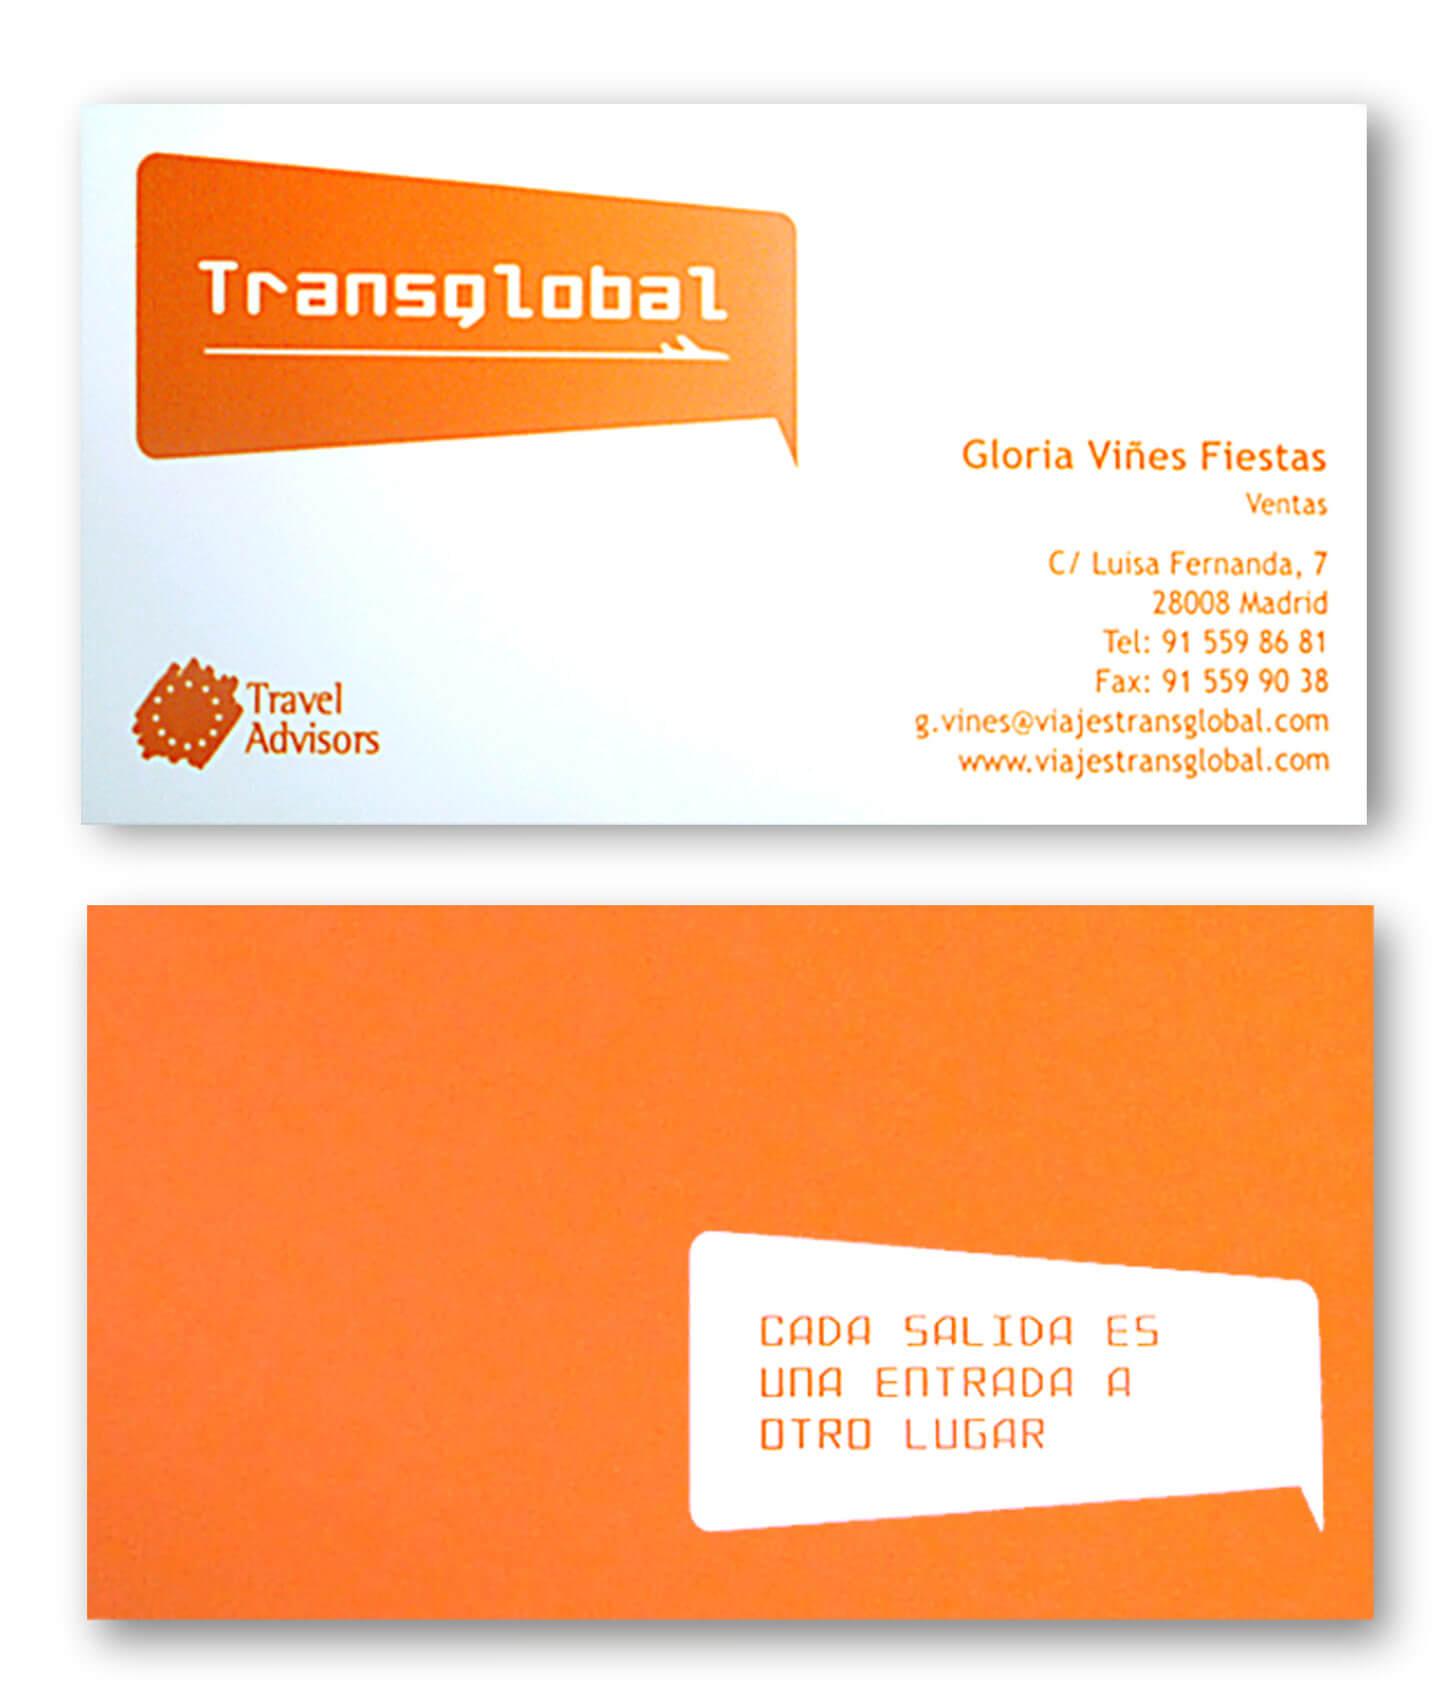 004-transglobal-tarjeta-anverso-y-reverso